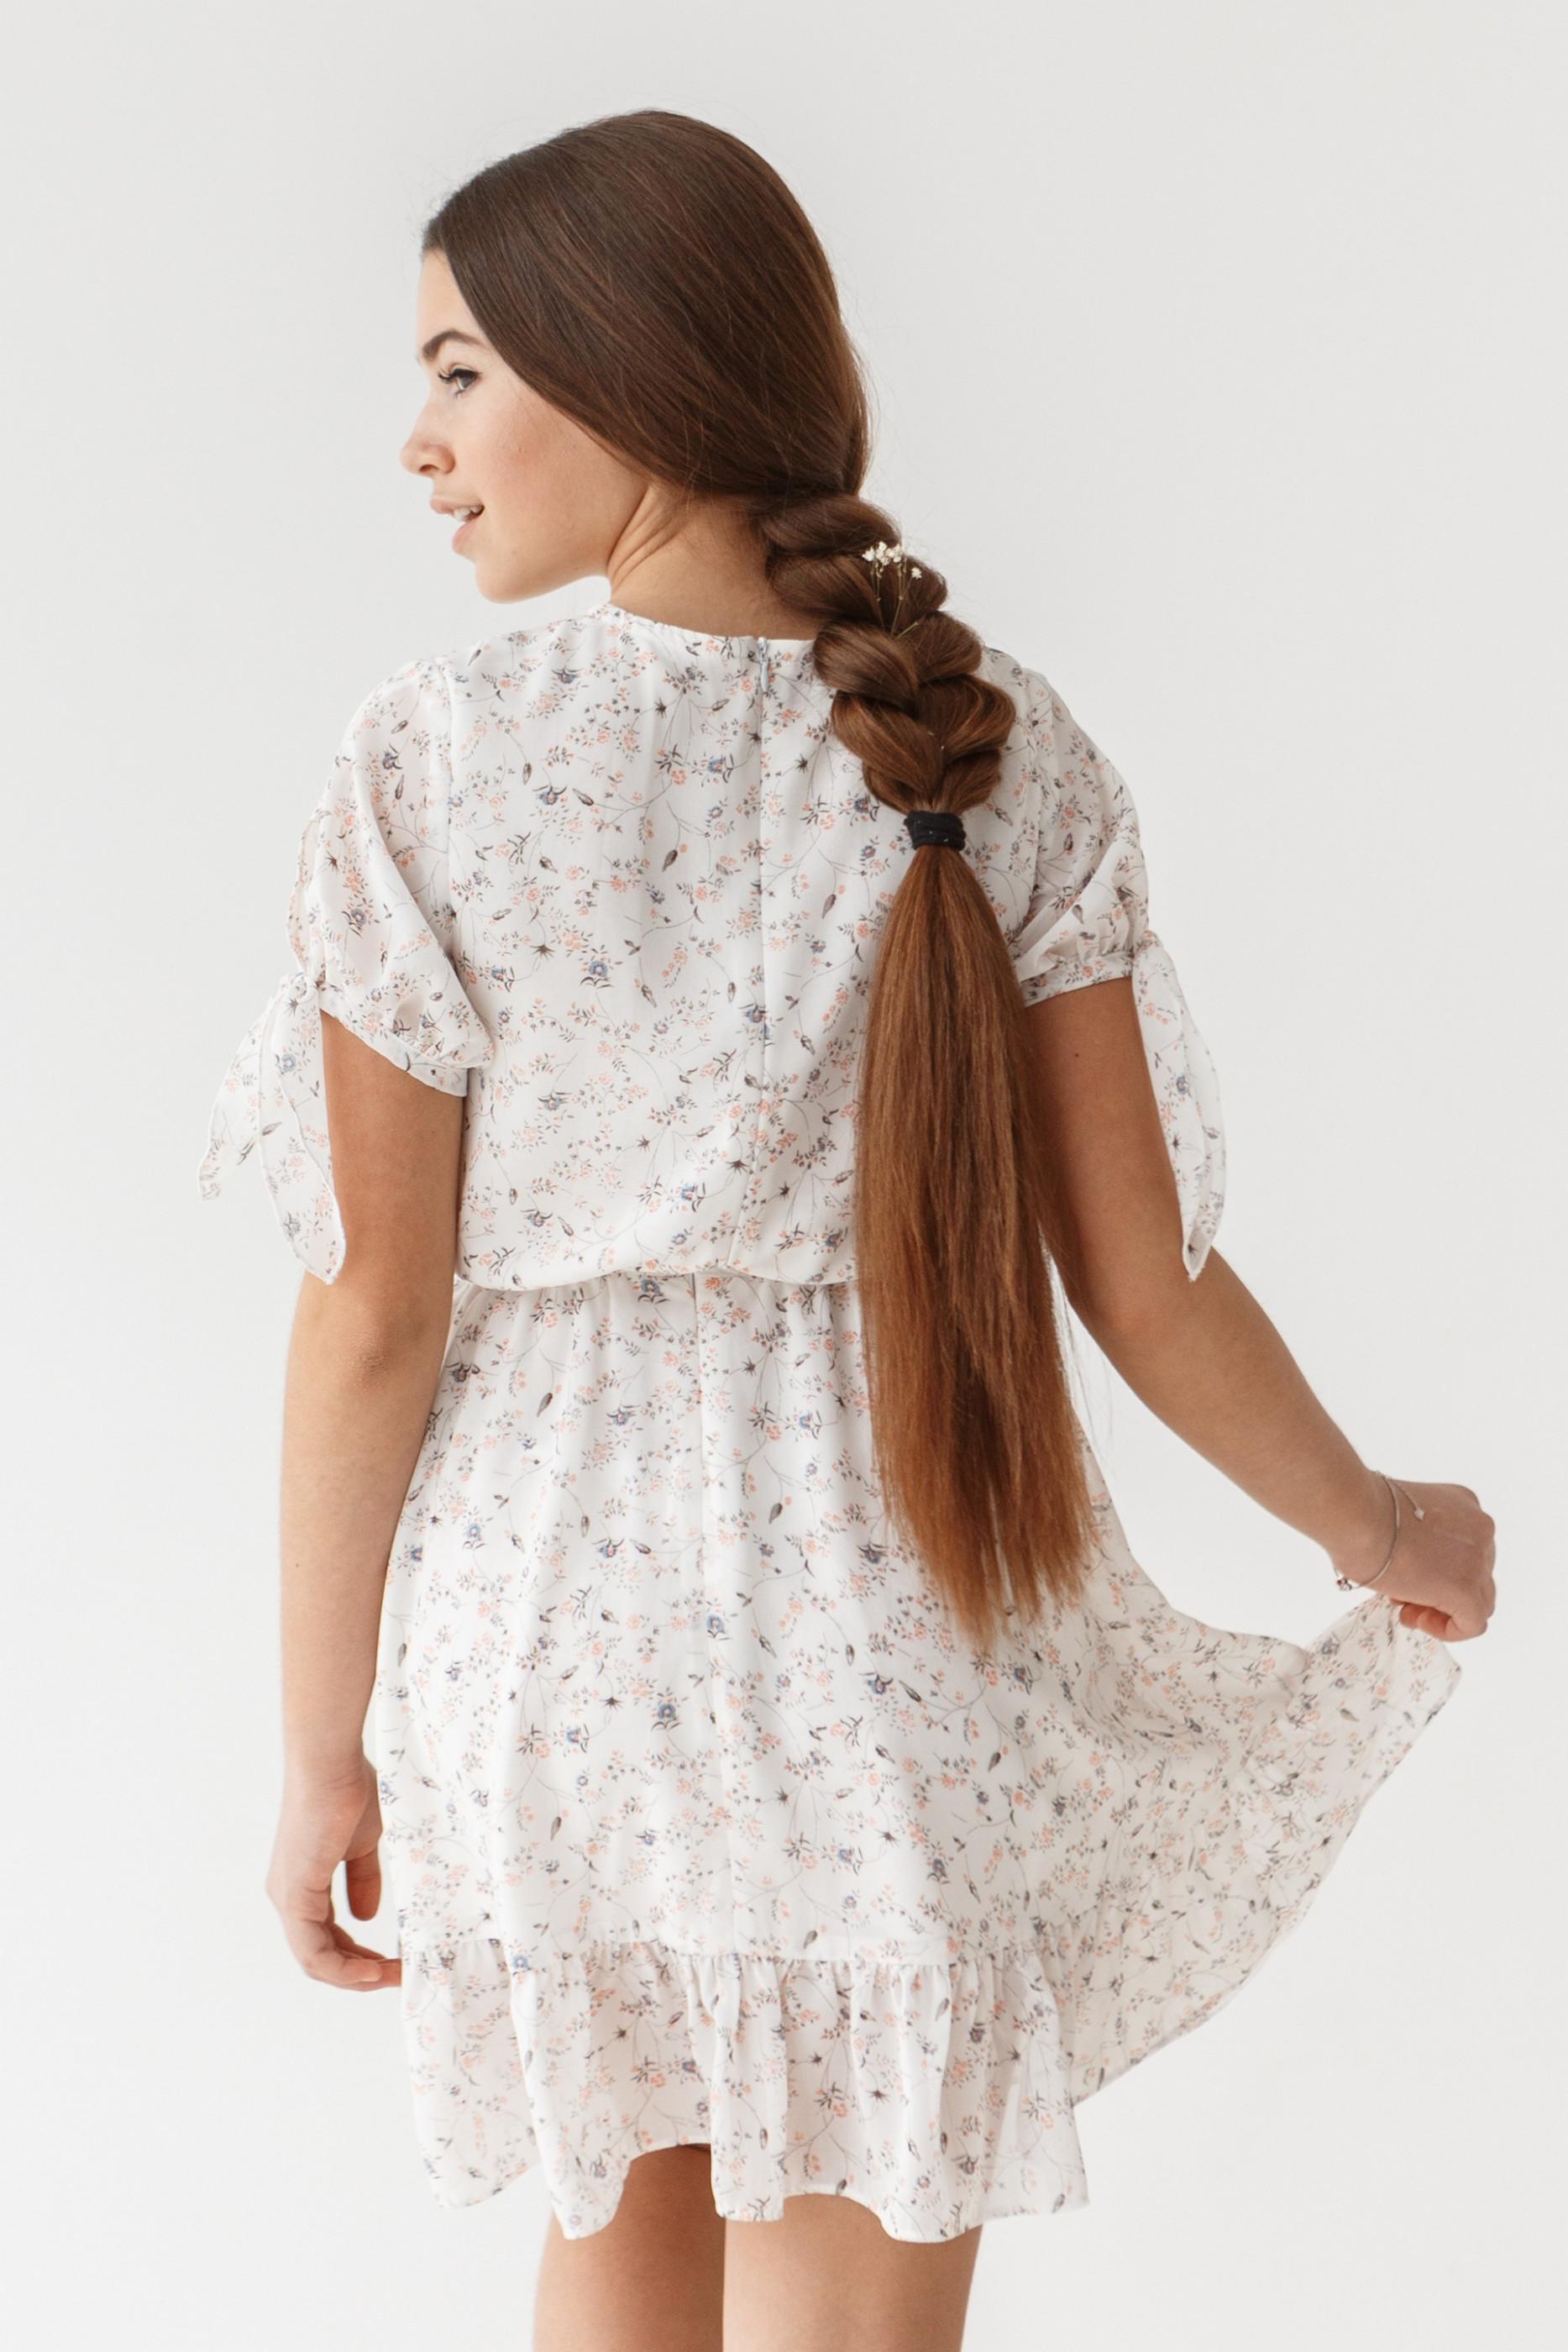 Плаття Еля, фото №3